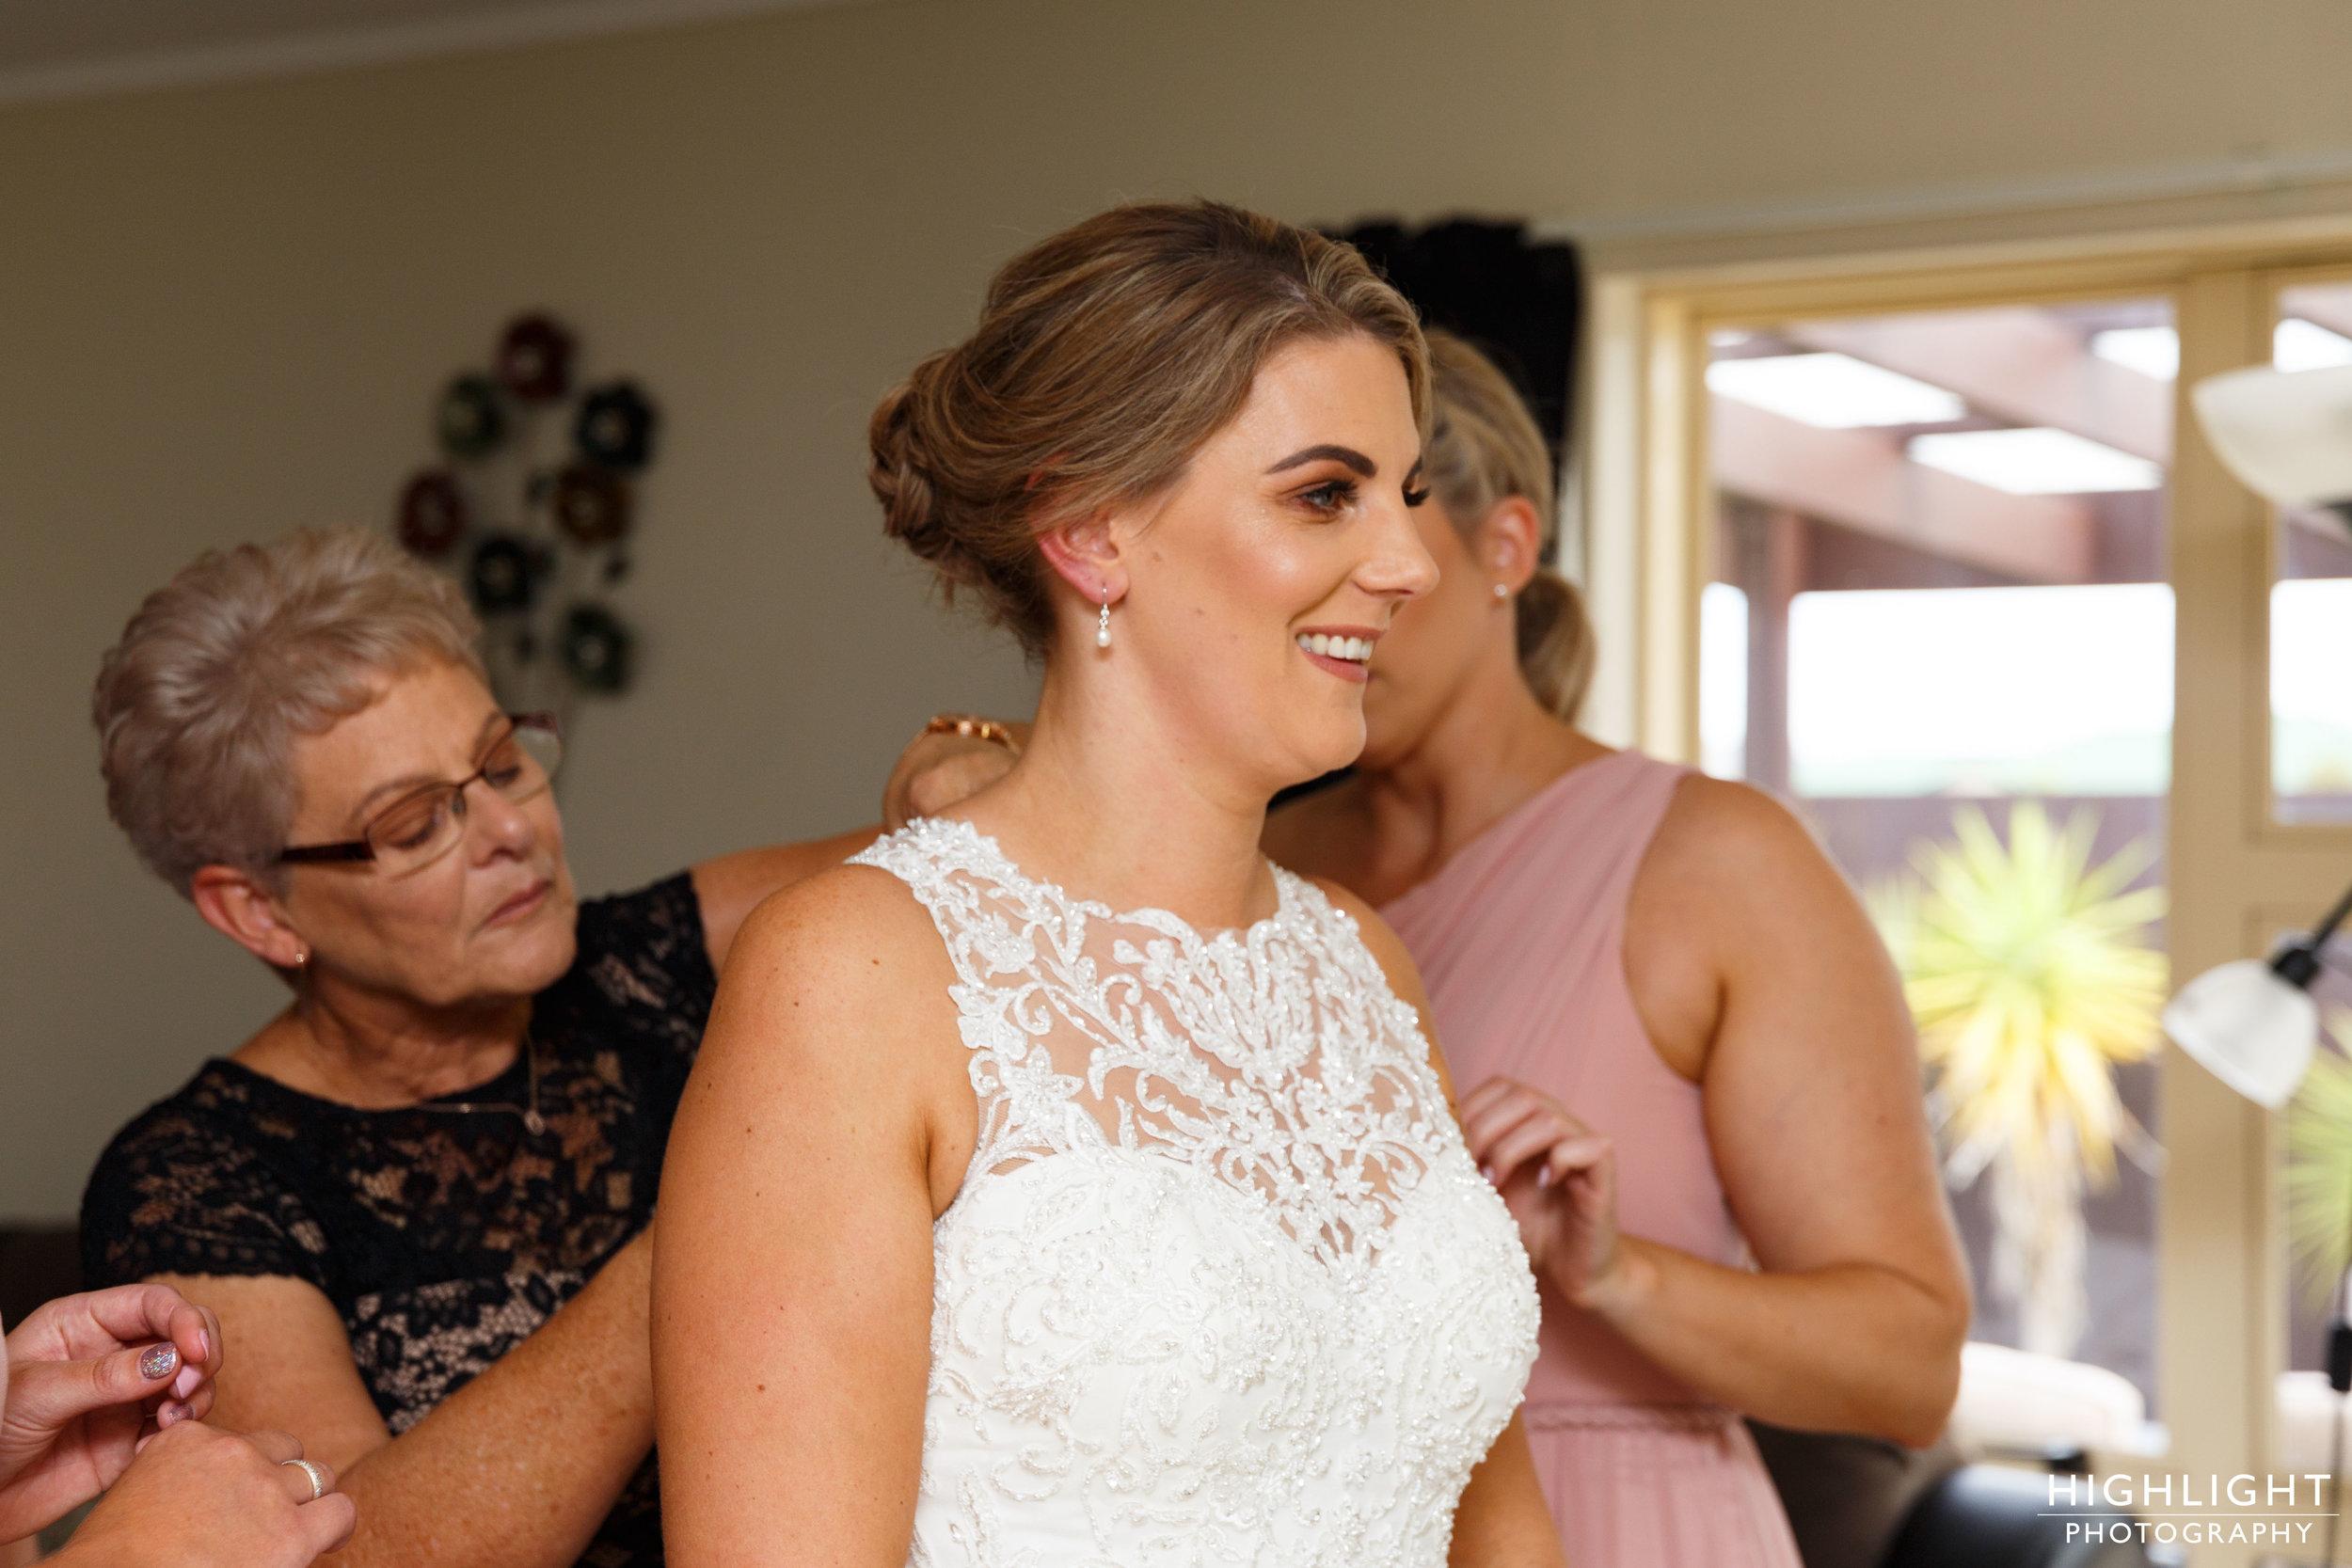 highlight-wedding-photography-palmerston-north-new-zealand-orlando-country-club-wedding-30.jpg